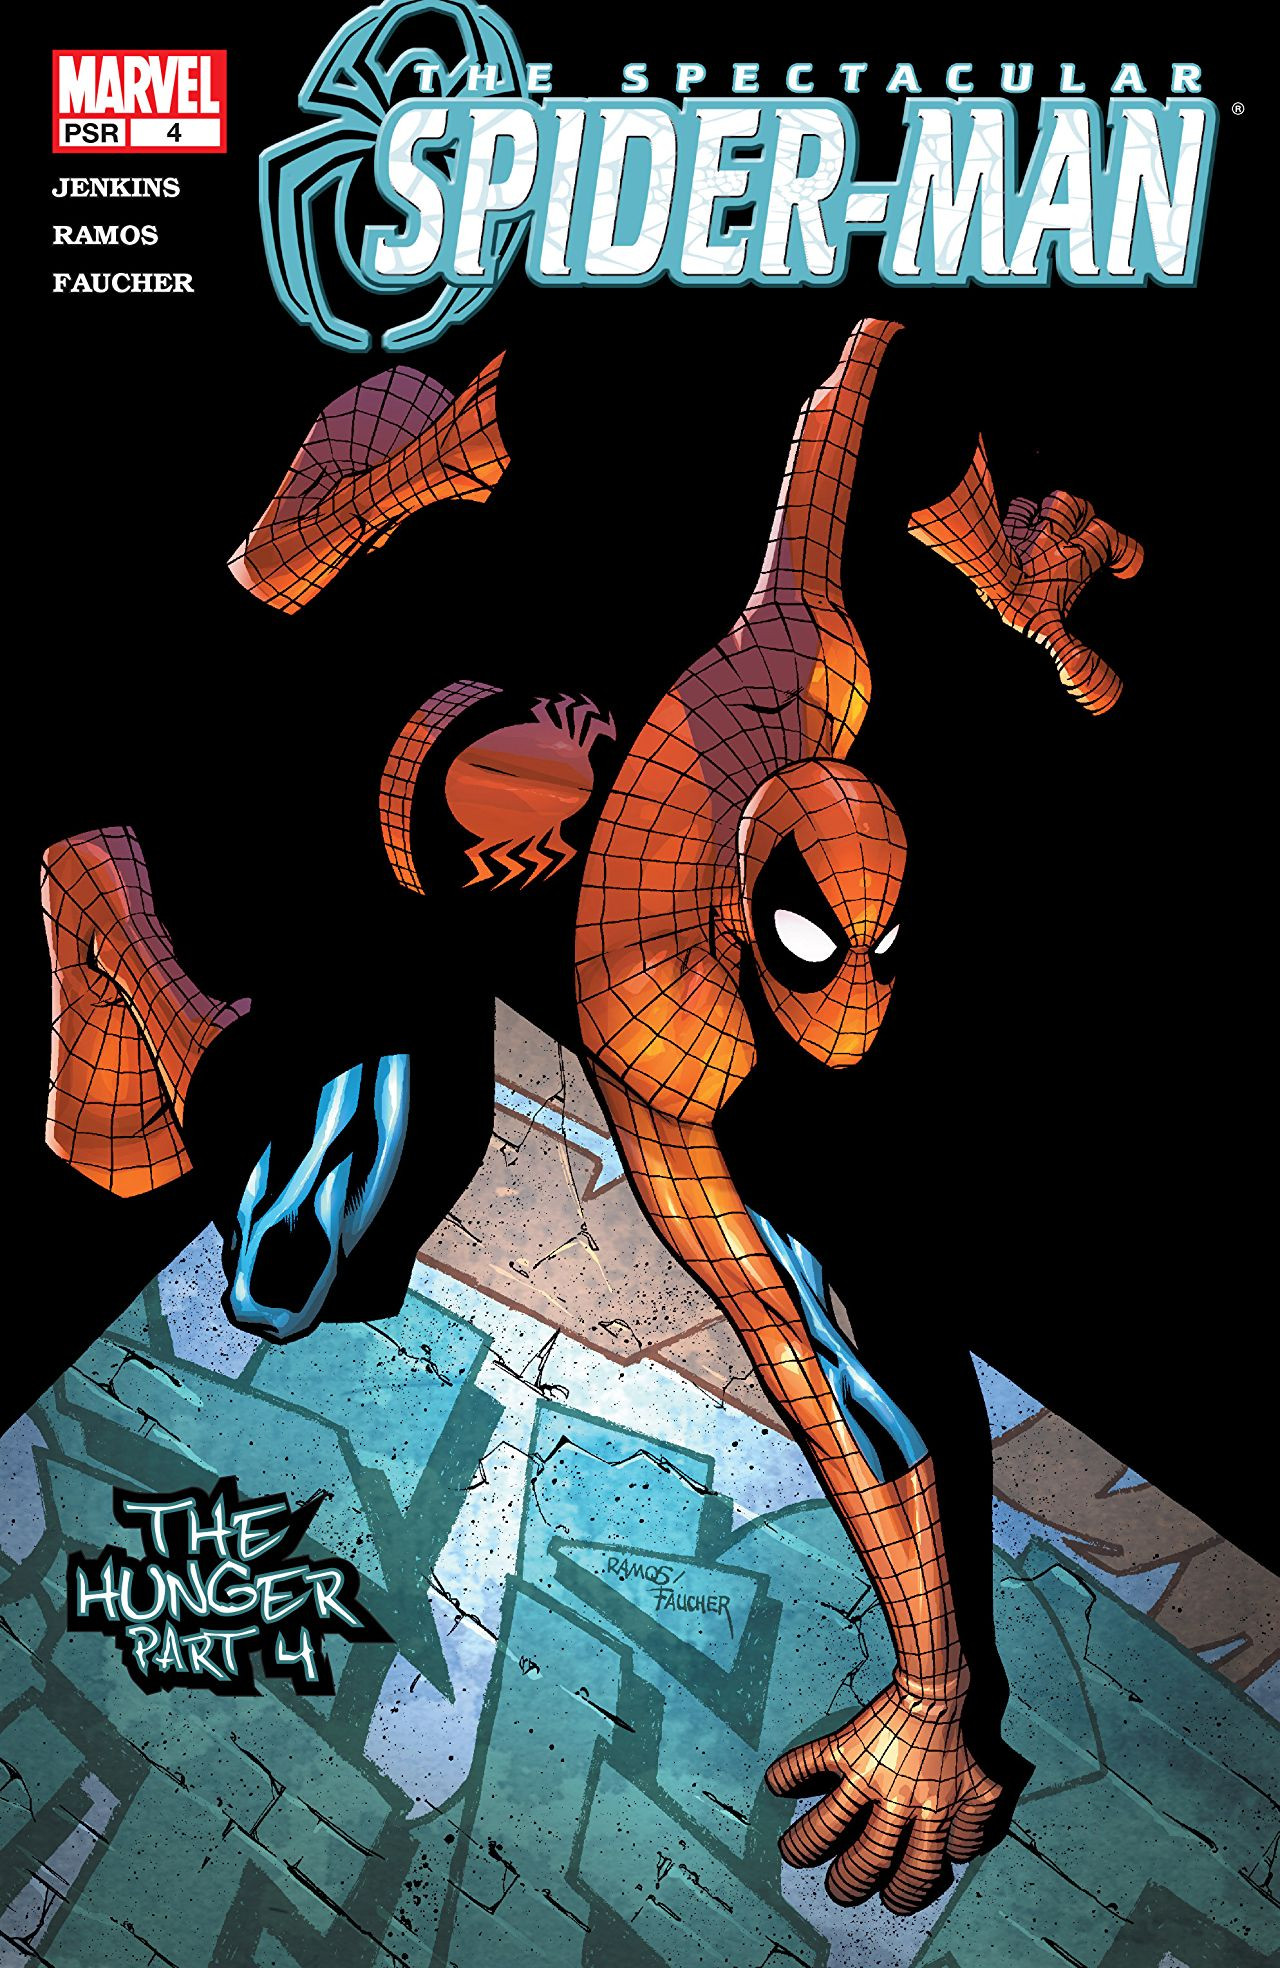 Spectacular Spider-Man Vol 2 4